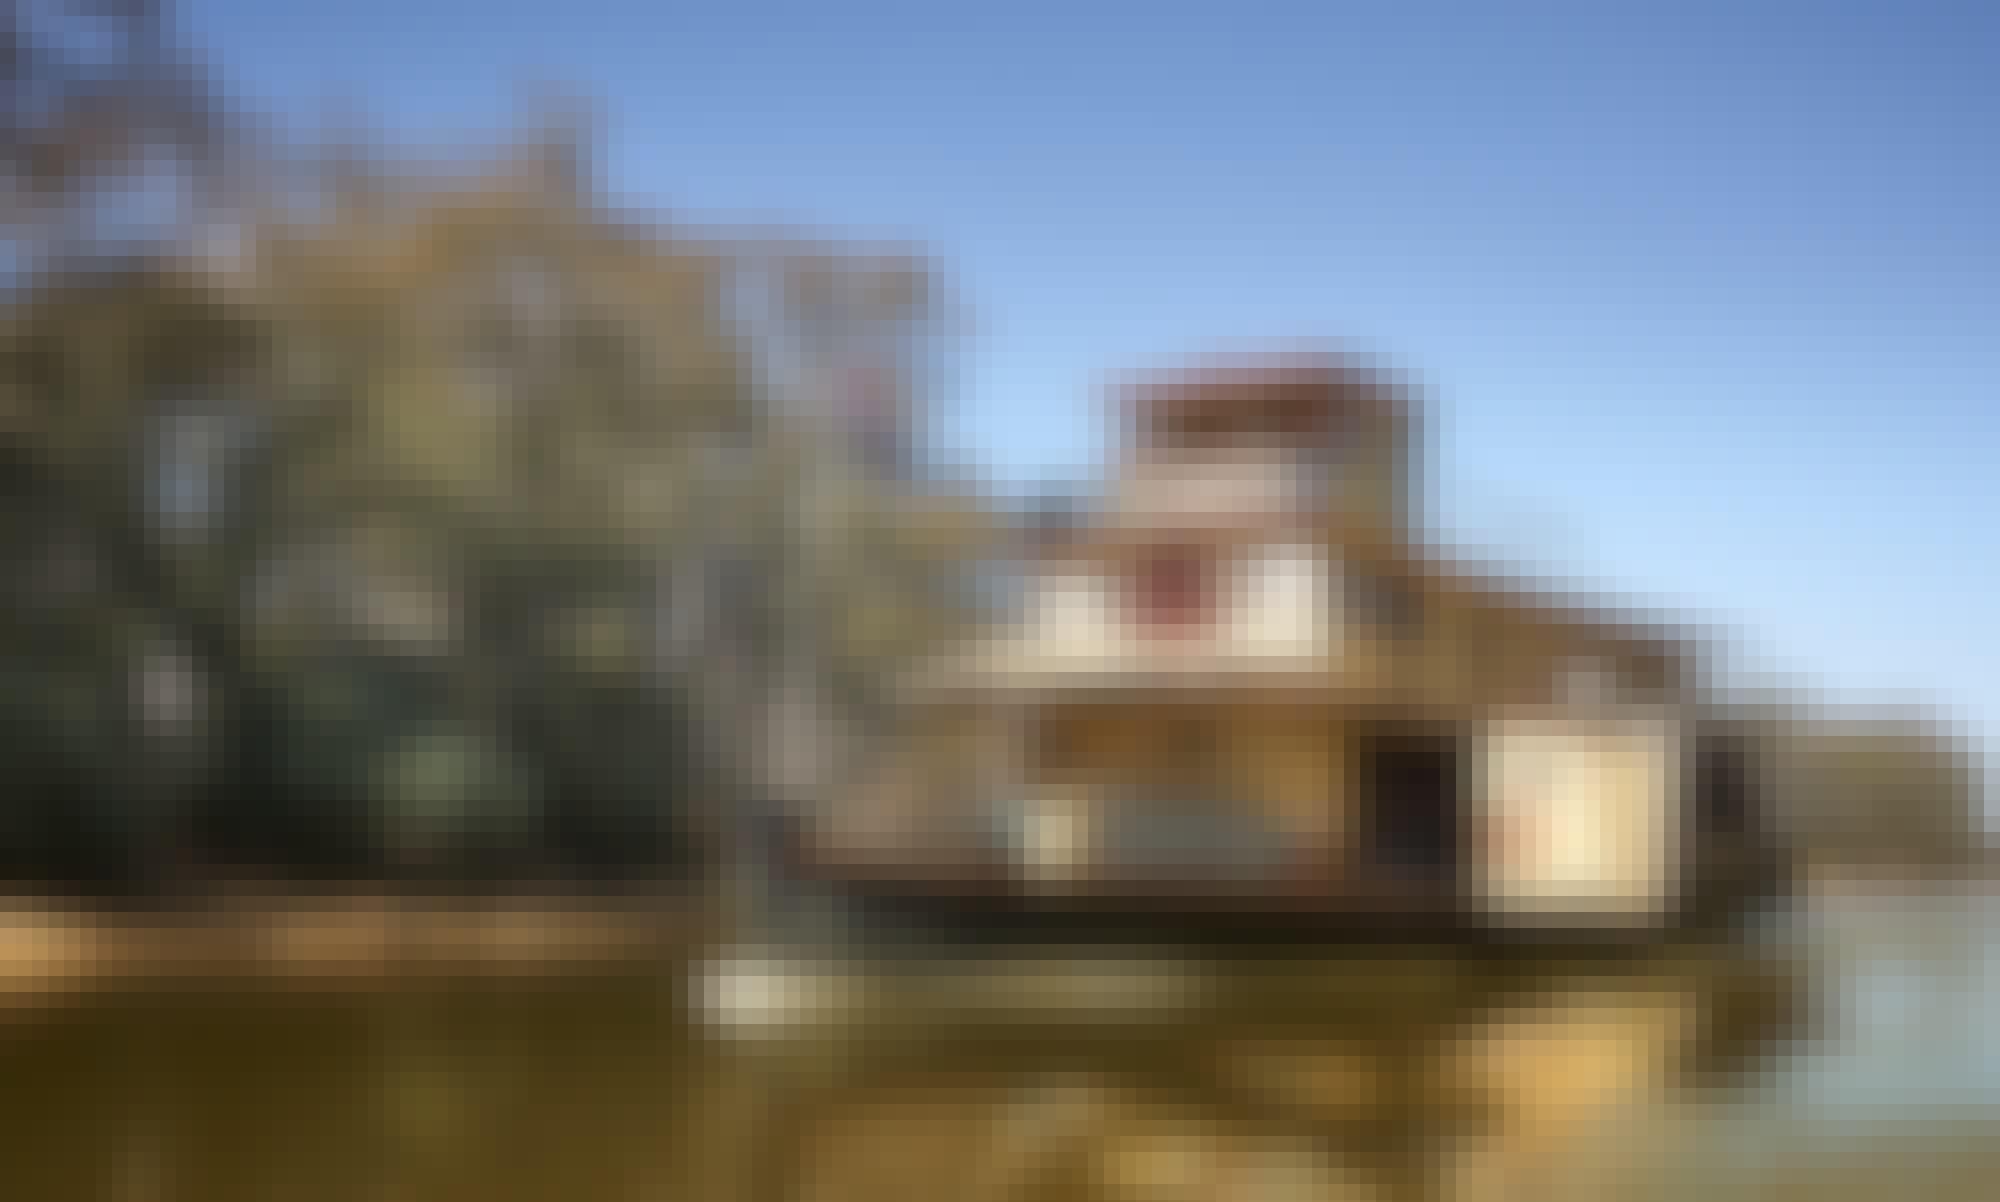 Paddlesteamer Emmylou on Murray River in Echuca, Australia